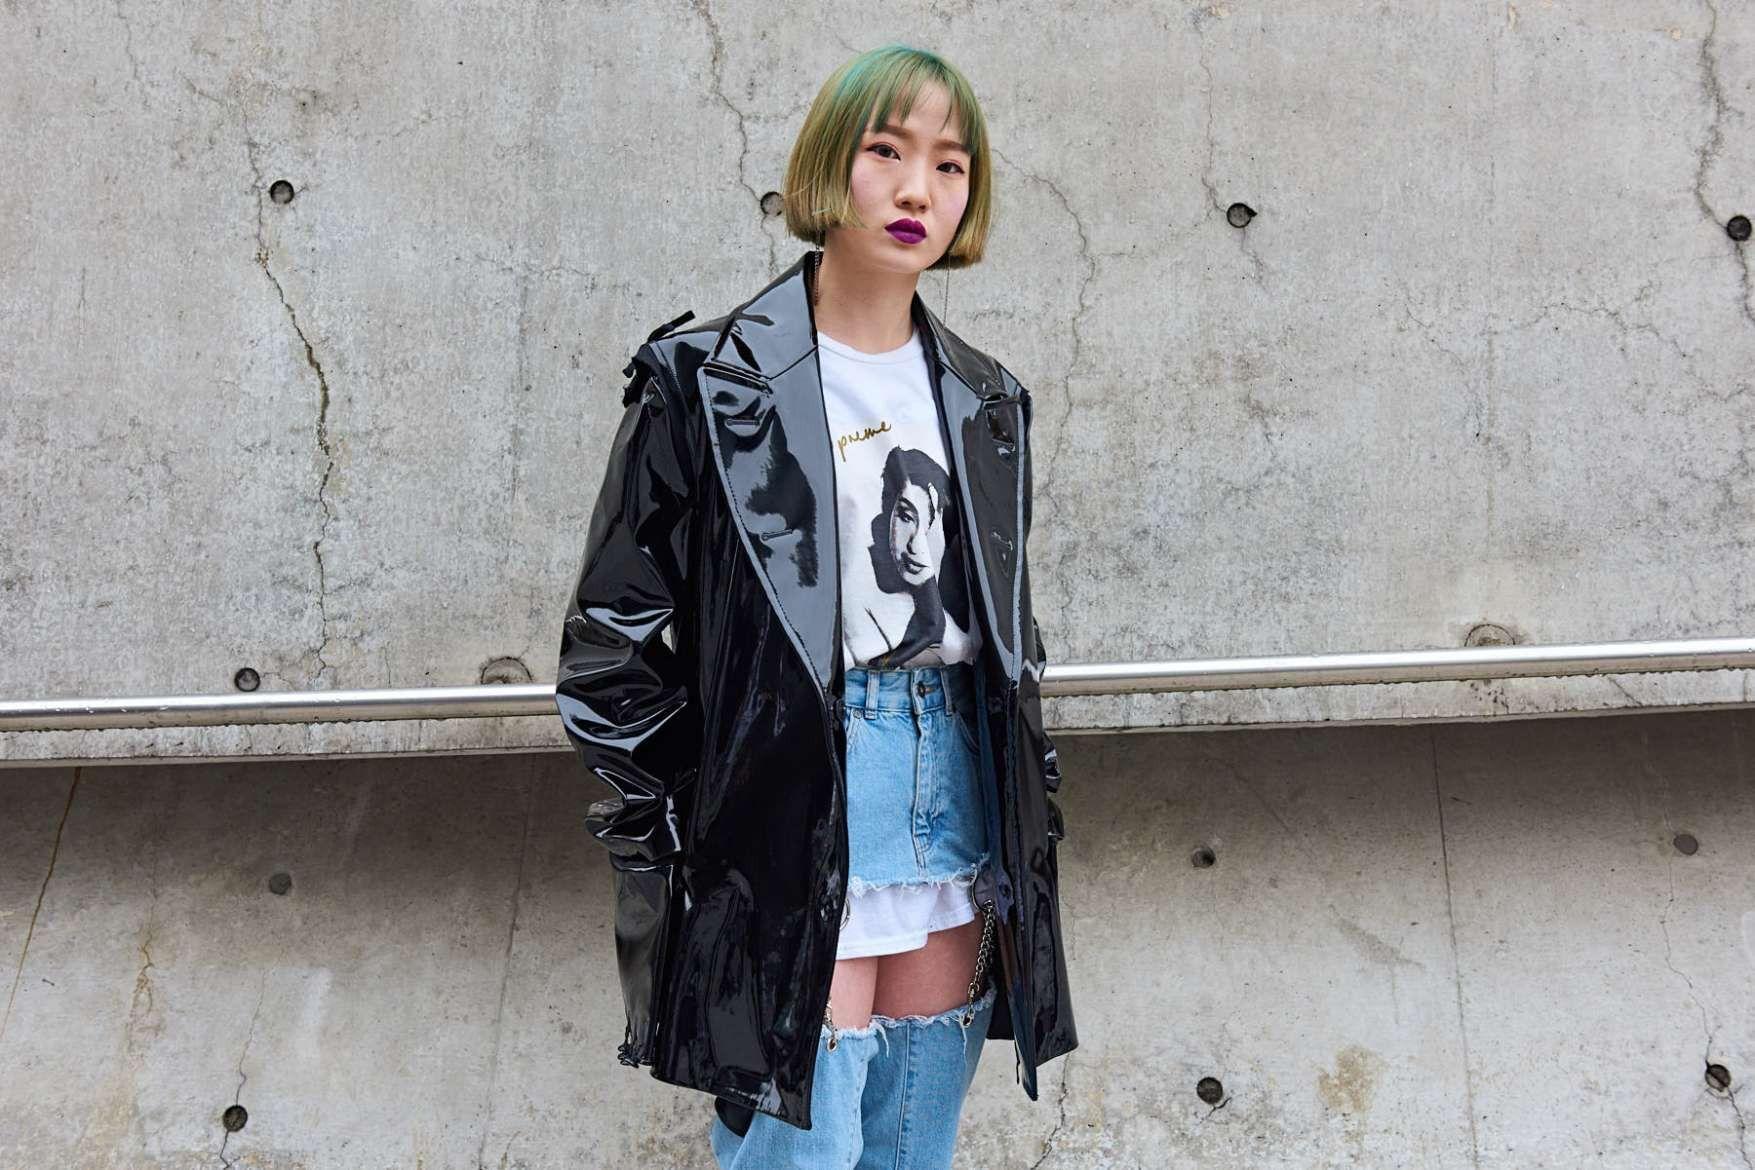 a77fb29b138c The Final Day of Seoul Fashion Week Fall/Winter 2018 Street Style ...